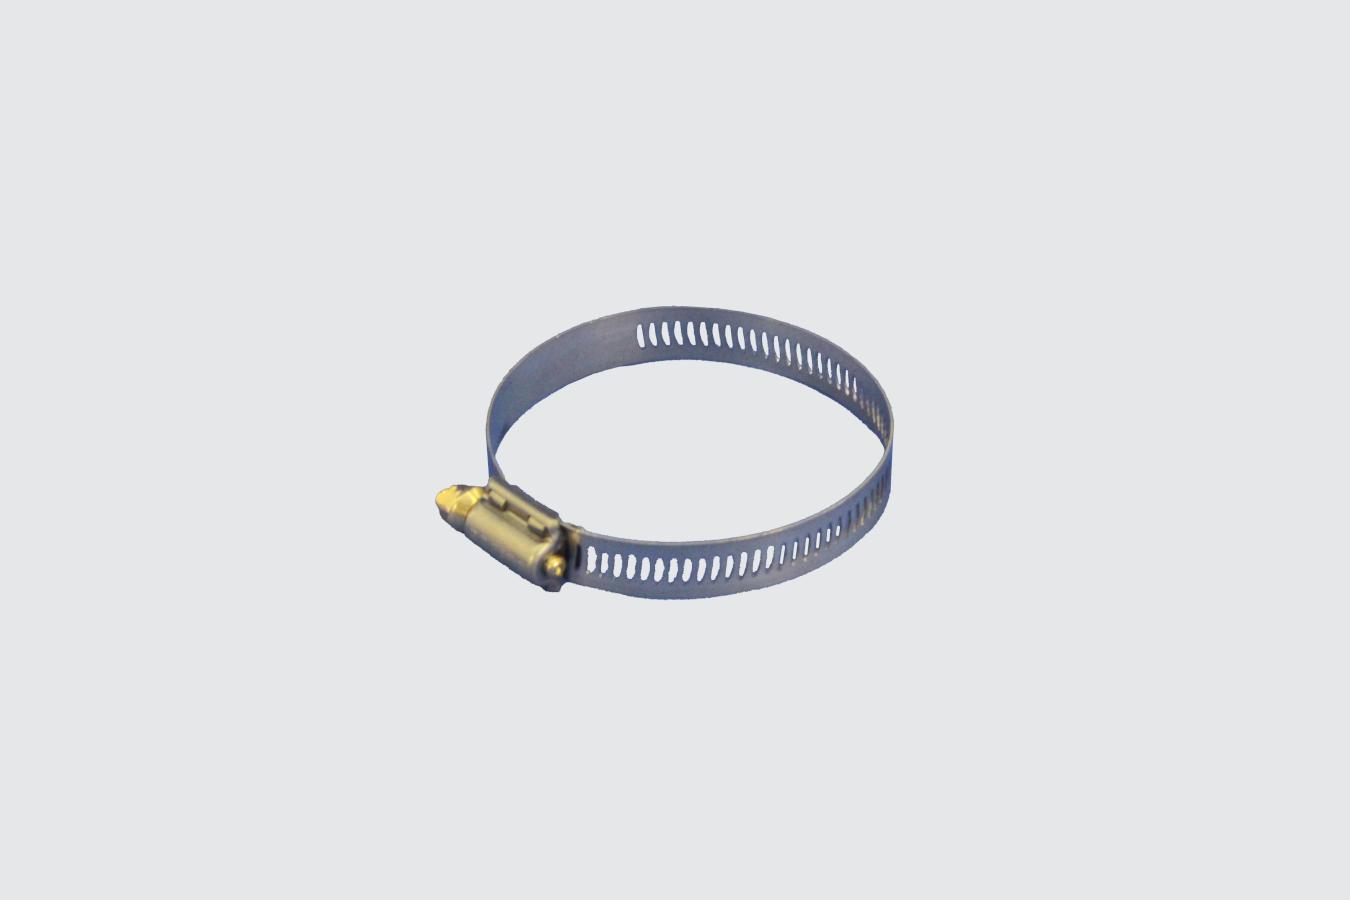 35222017-CLAMP, 2.25-3.00 ID WORM GEAR ZINC